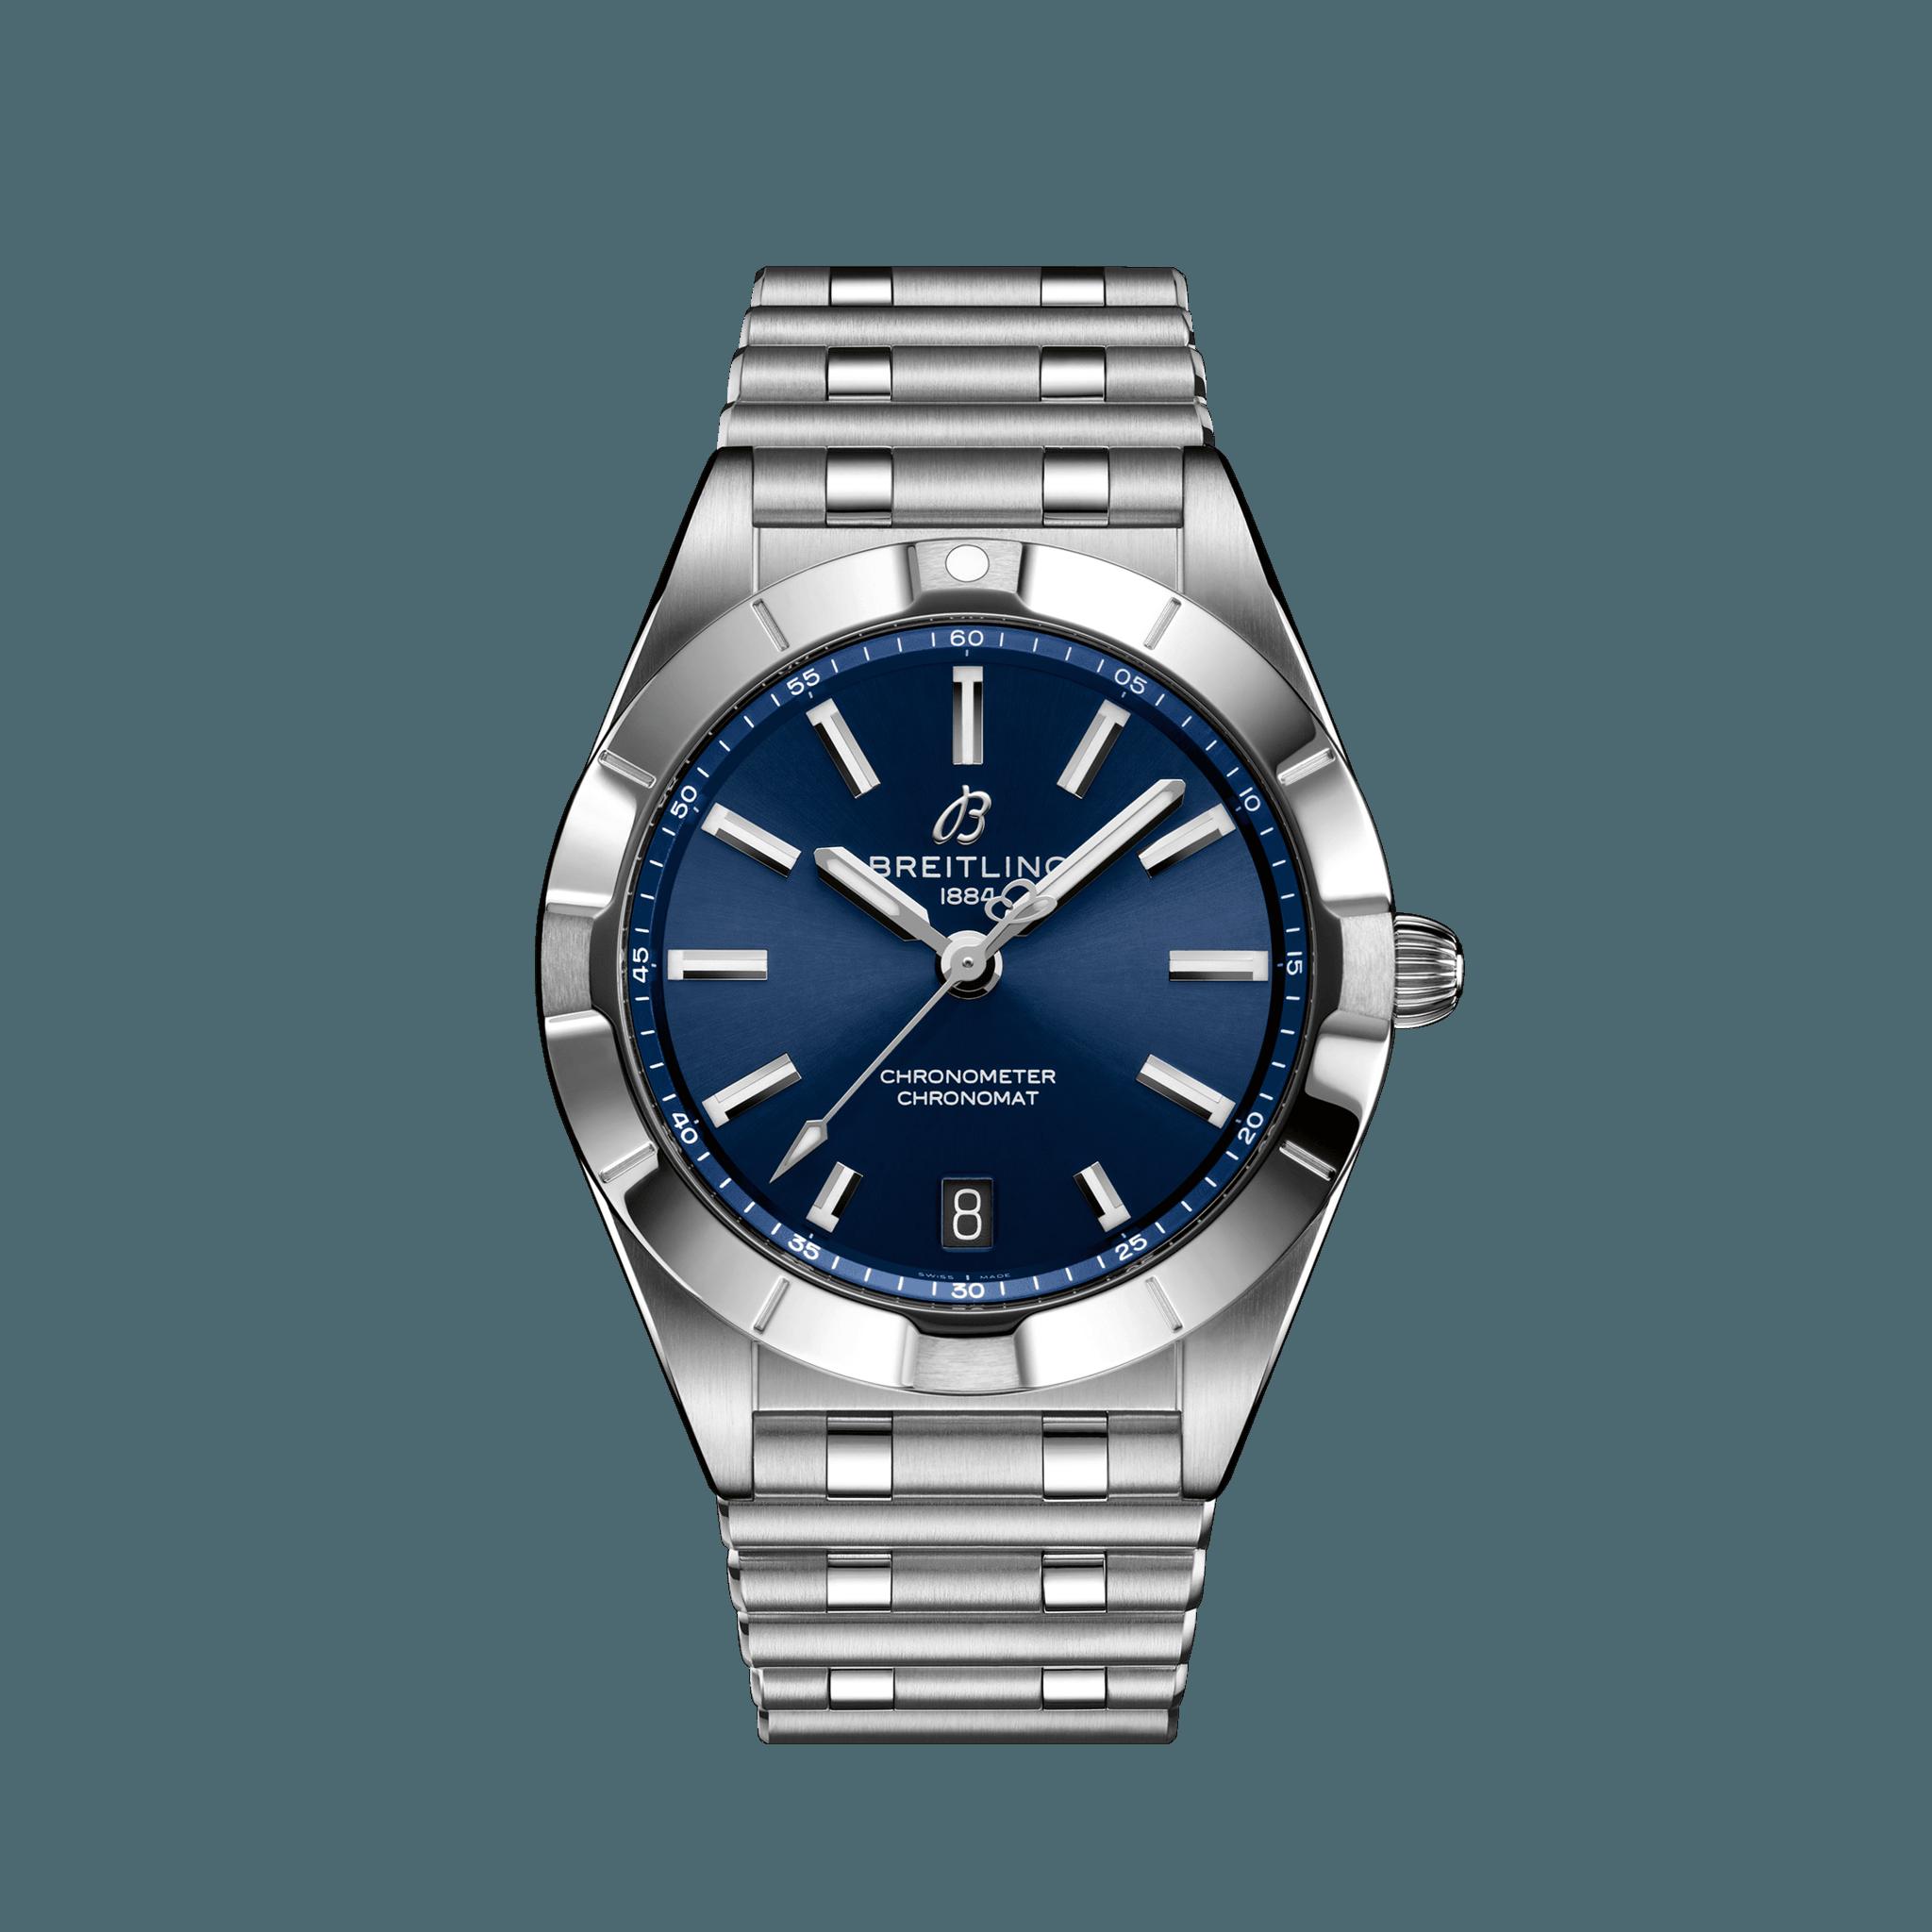 Breitling Chronomat 32 Quarz